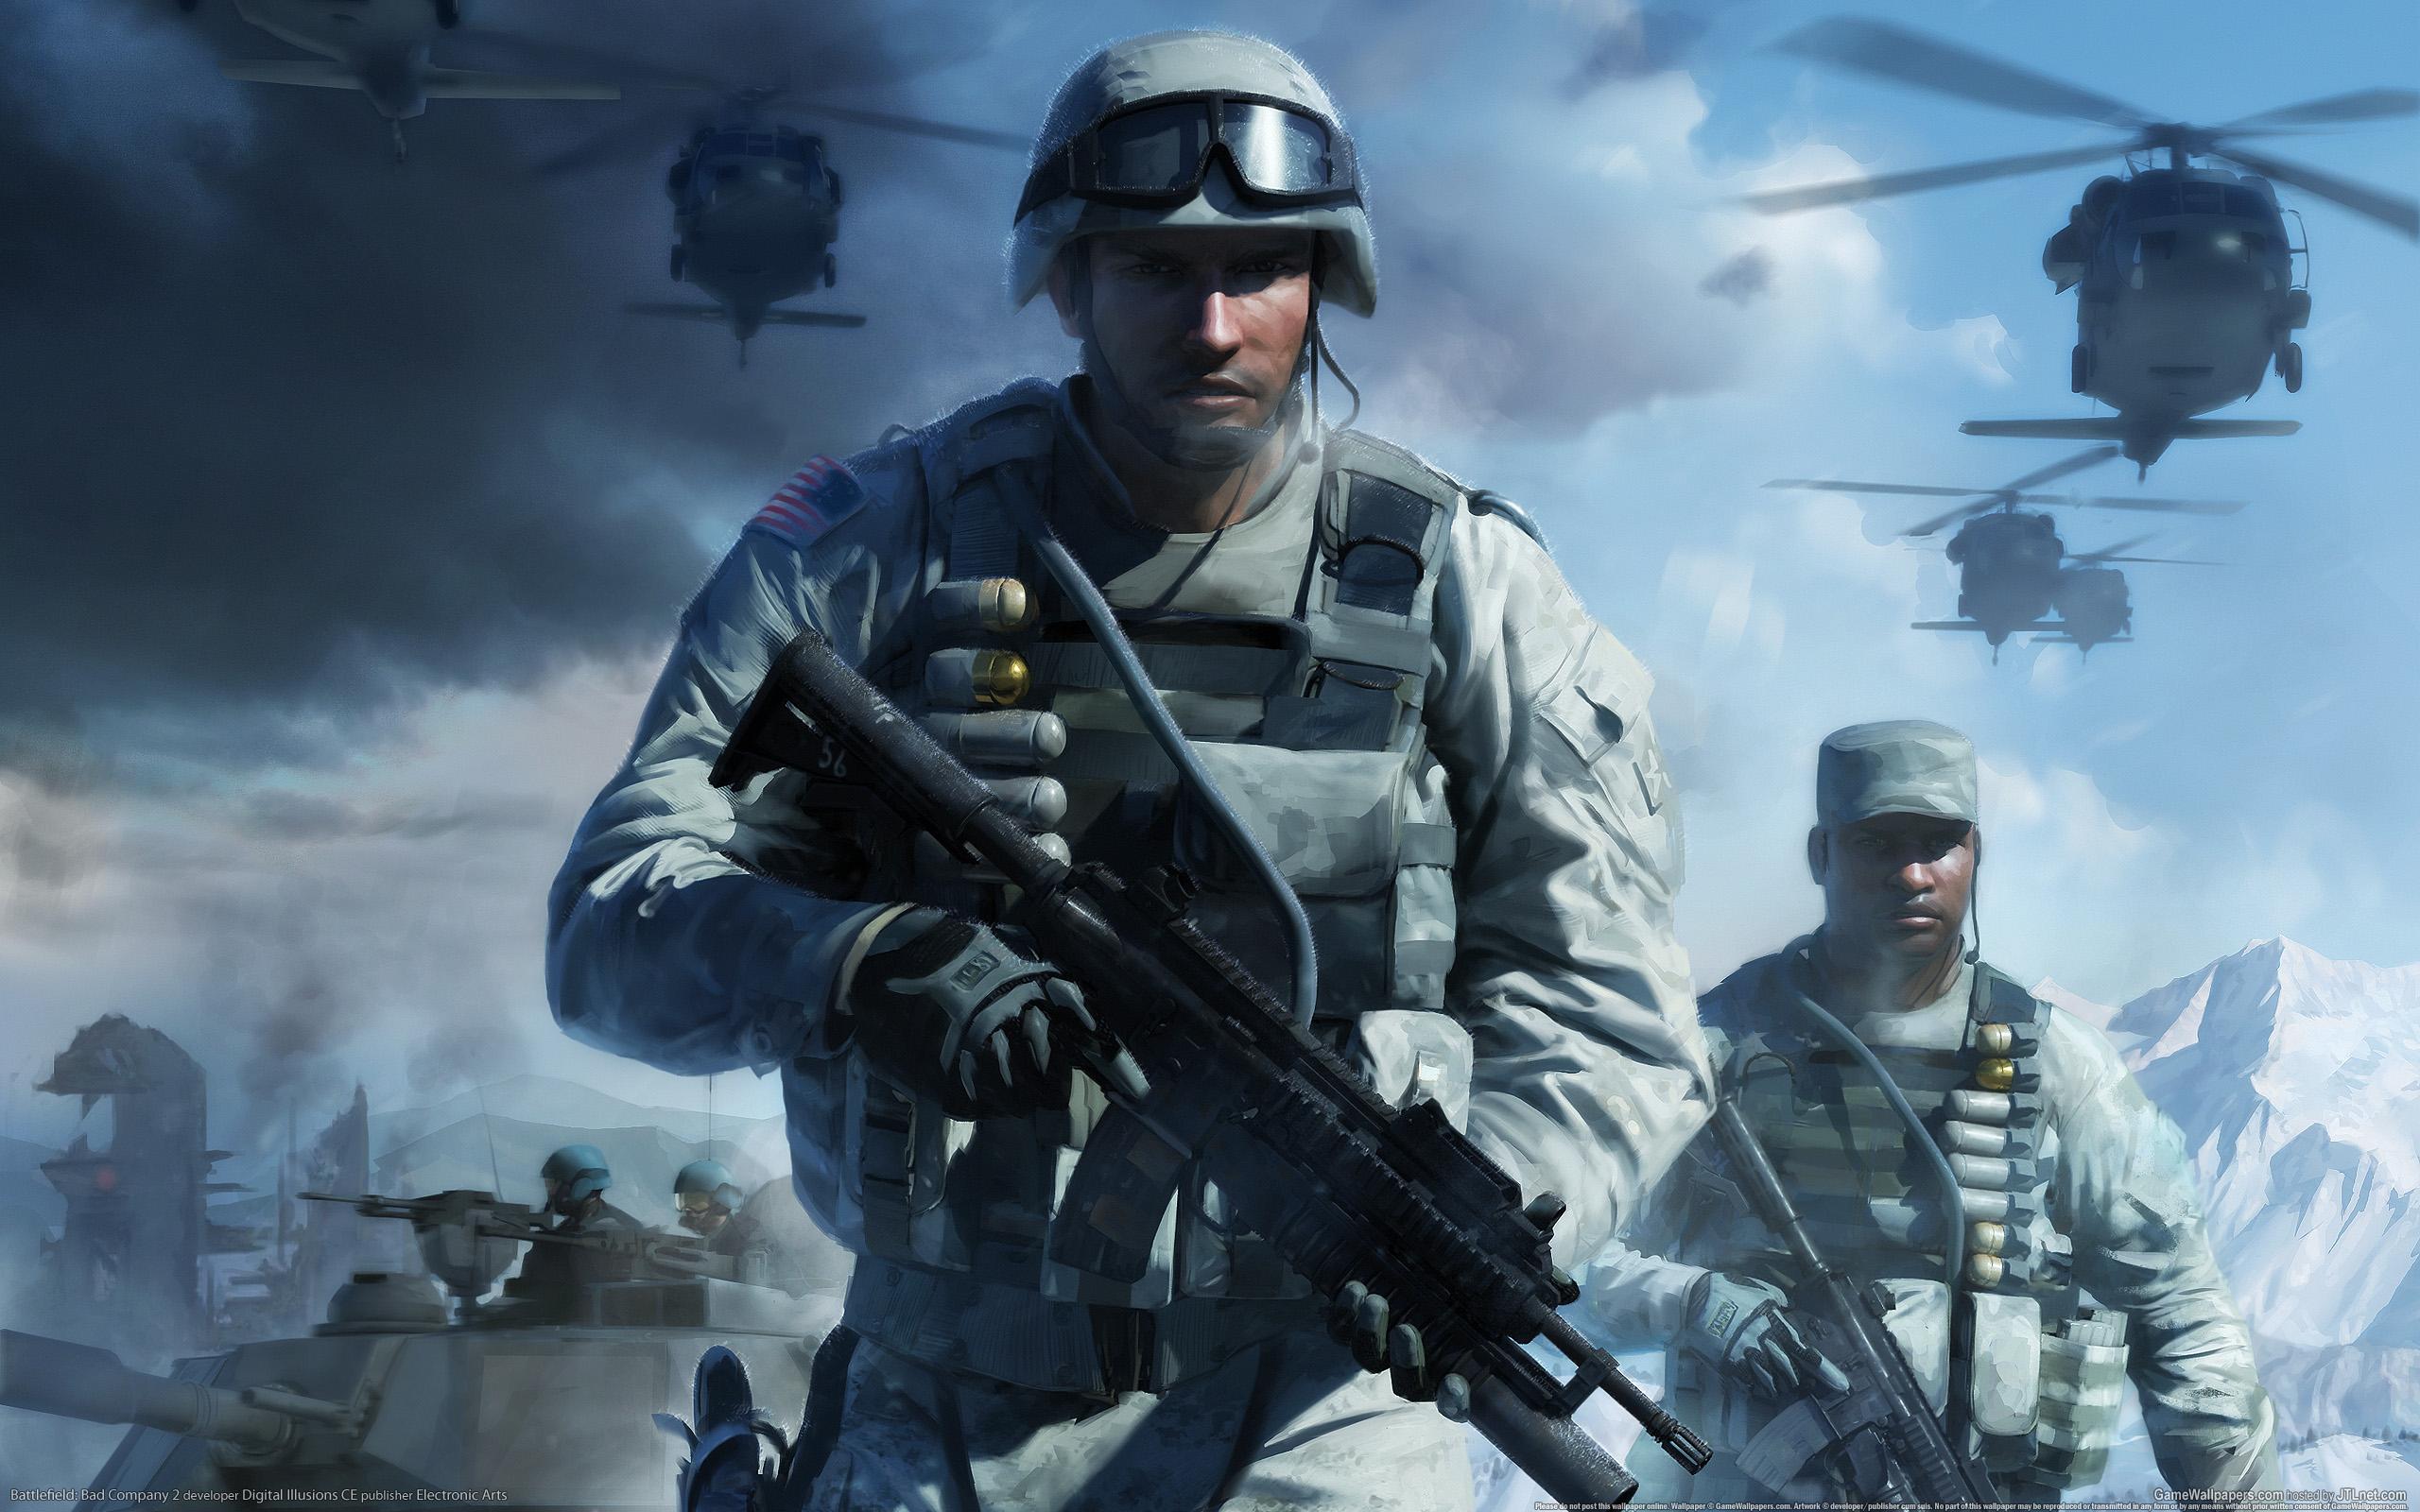 Battlefield 3 Bad Company 2 Vietnam Wallpapers   Taringa 2560x1600